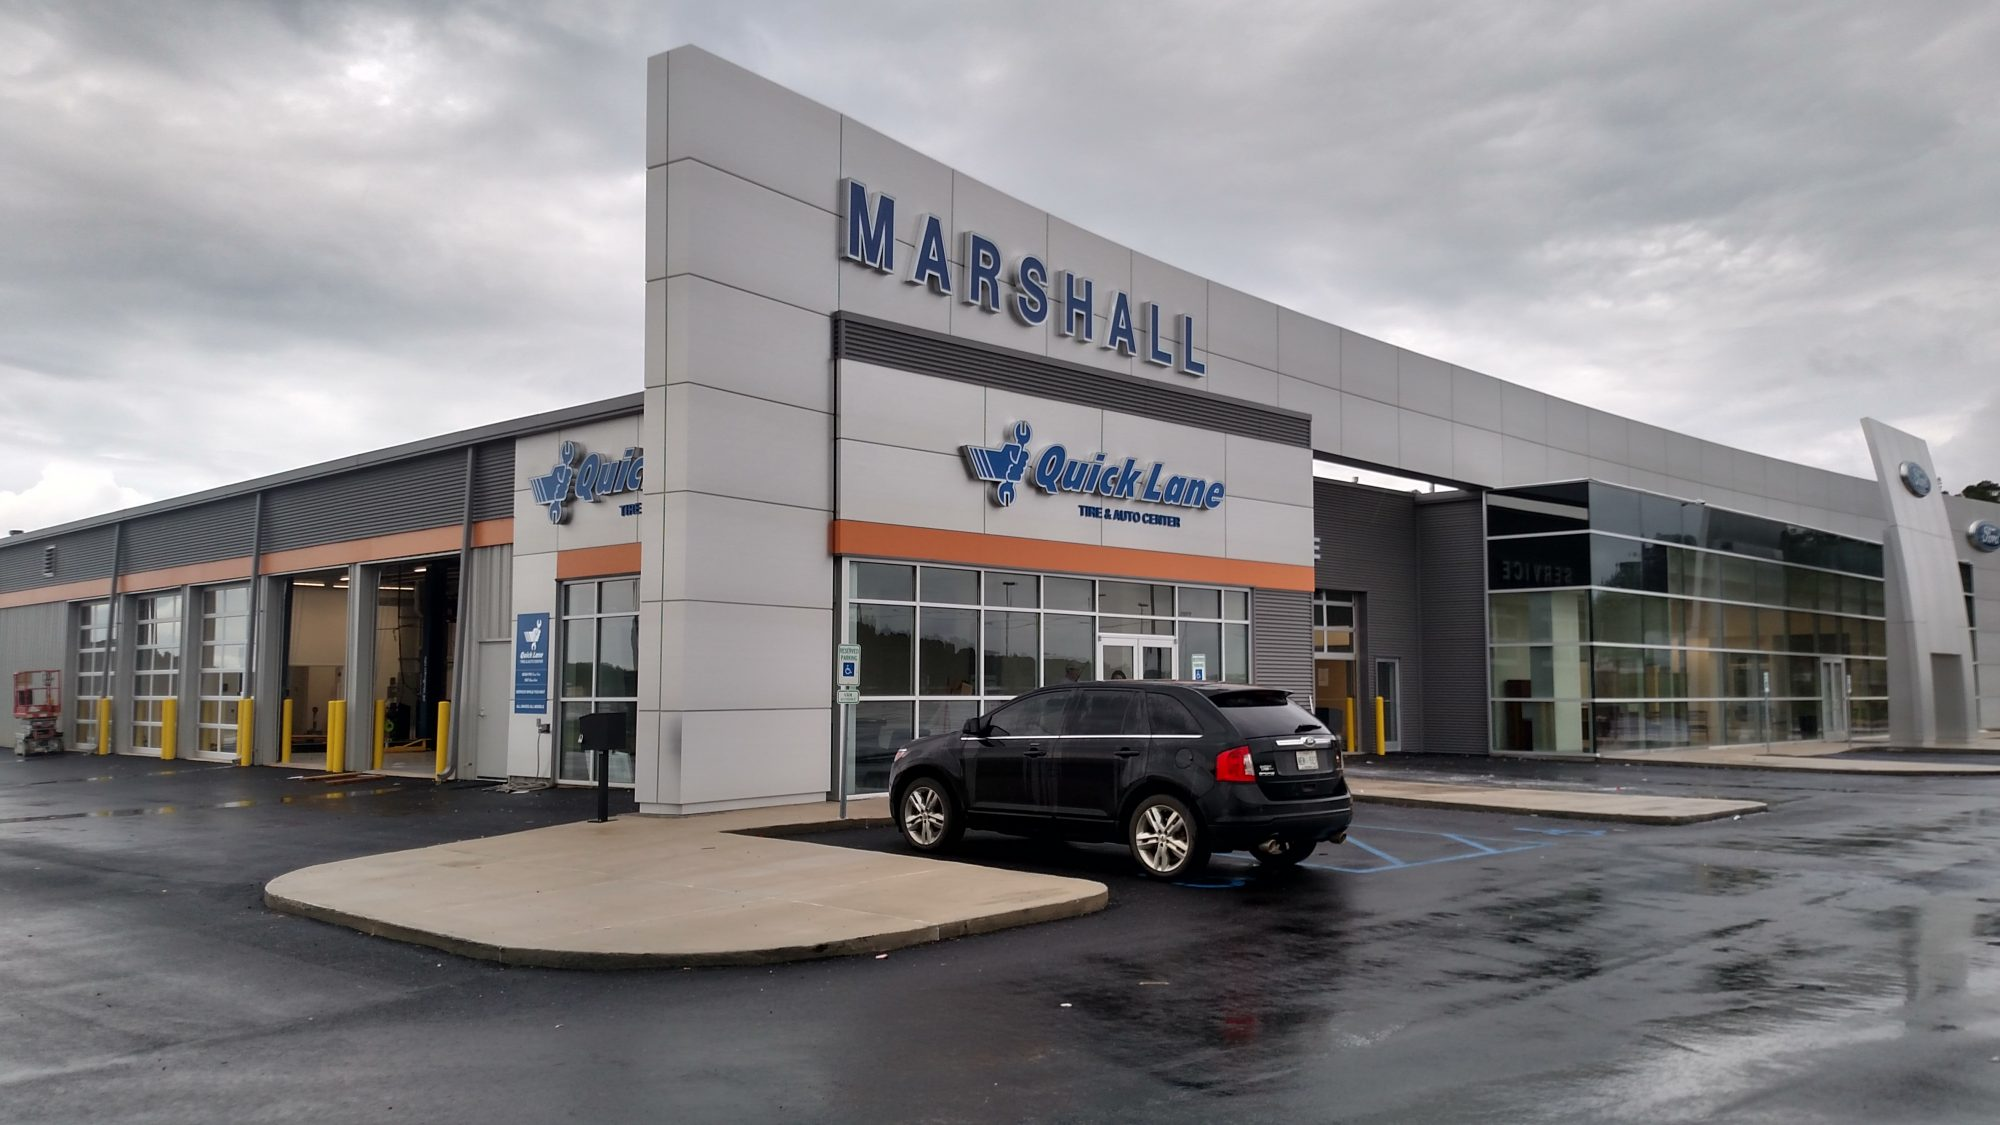 Used Cars Wichita Ks >> Marshall Ford - Philadelphia, MS - CCS Image Group